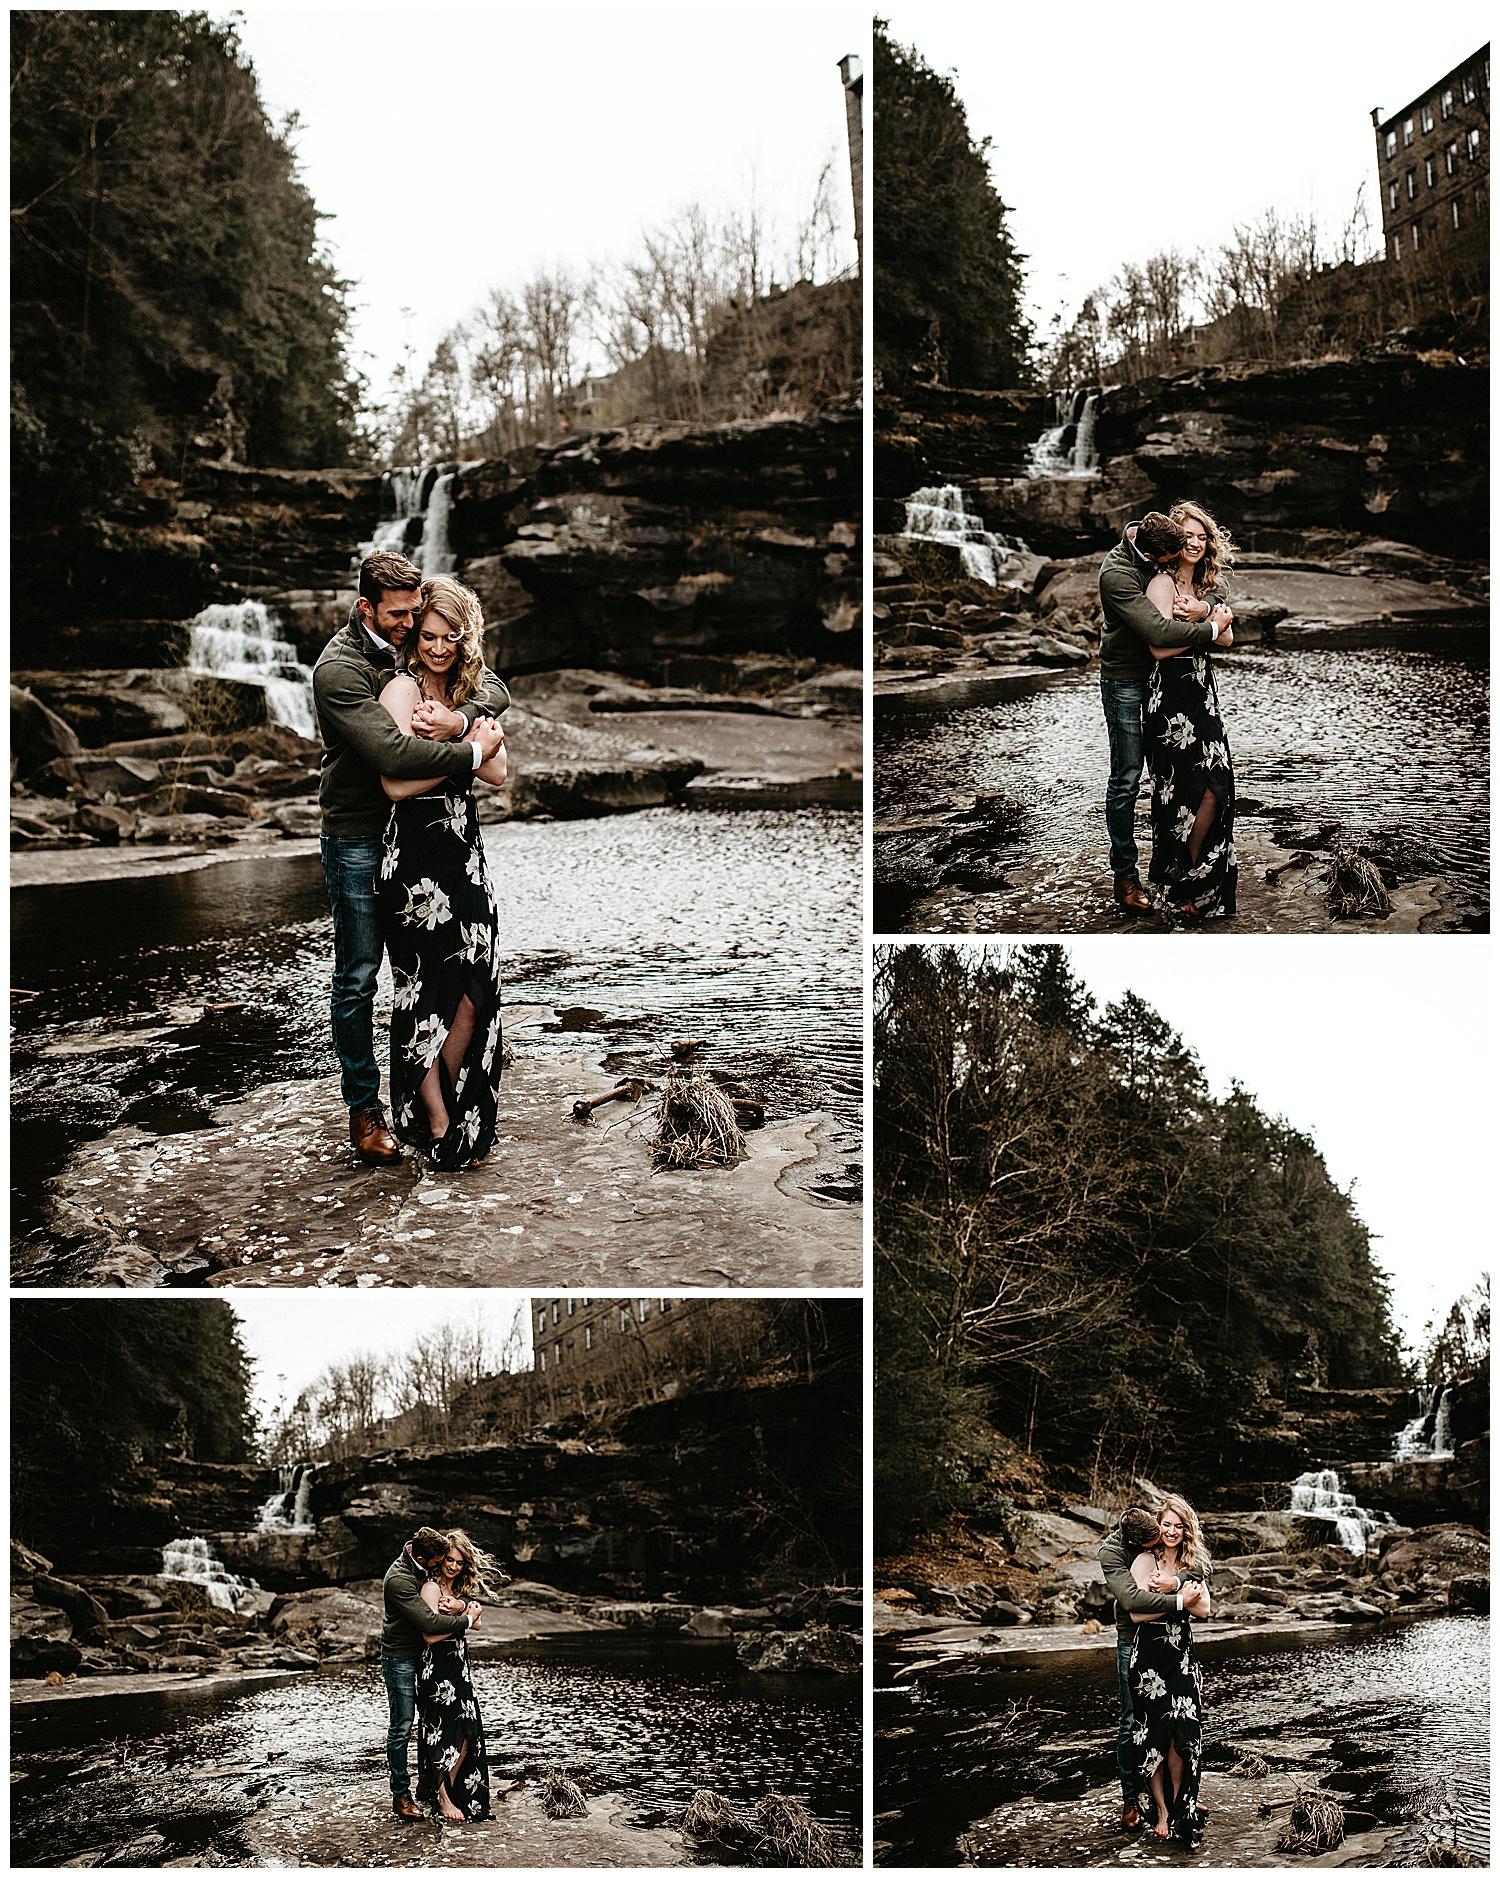 NEPA-Lehigh-Valley-Wedding-Photographer-Ledges-Hotel-Hawley-PA_0018.jpg